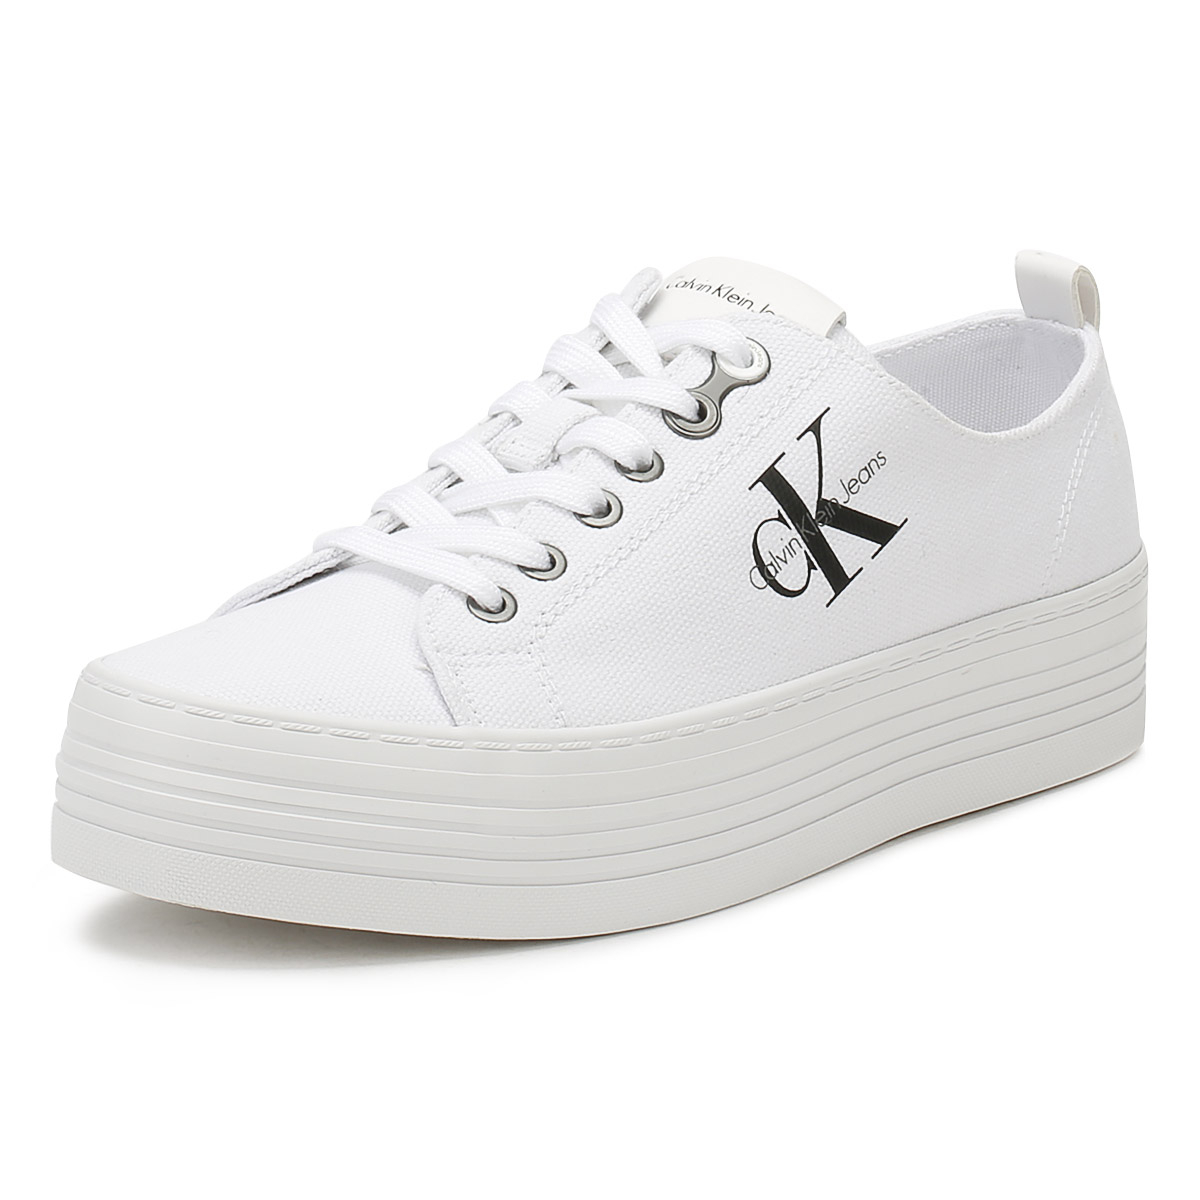 2f1cf52e9f3d Details about Calvin Klein Jeans Womens Platform Trainers White Zolah  Canvas Lace Up Shoes